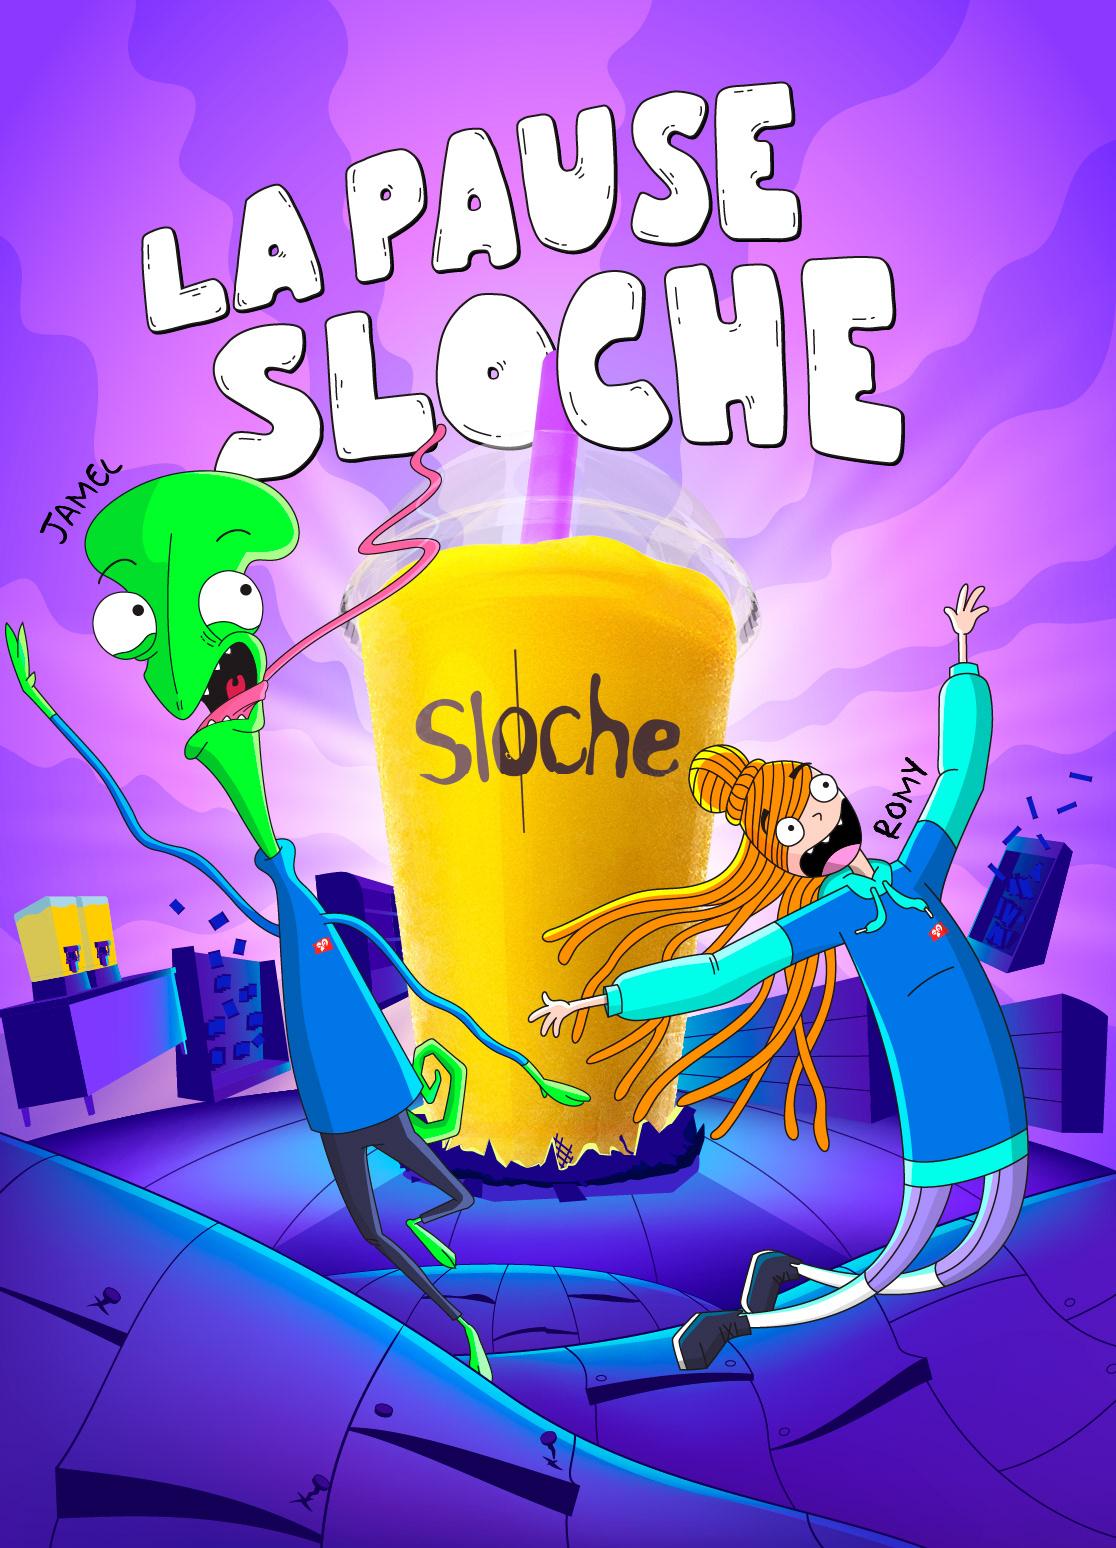 couche-tard havas sloche slush slushee Slushie Animated Series